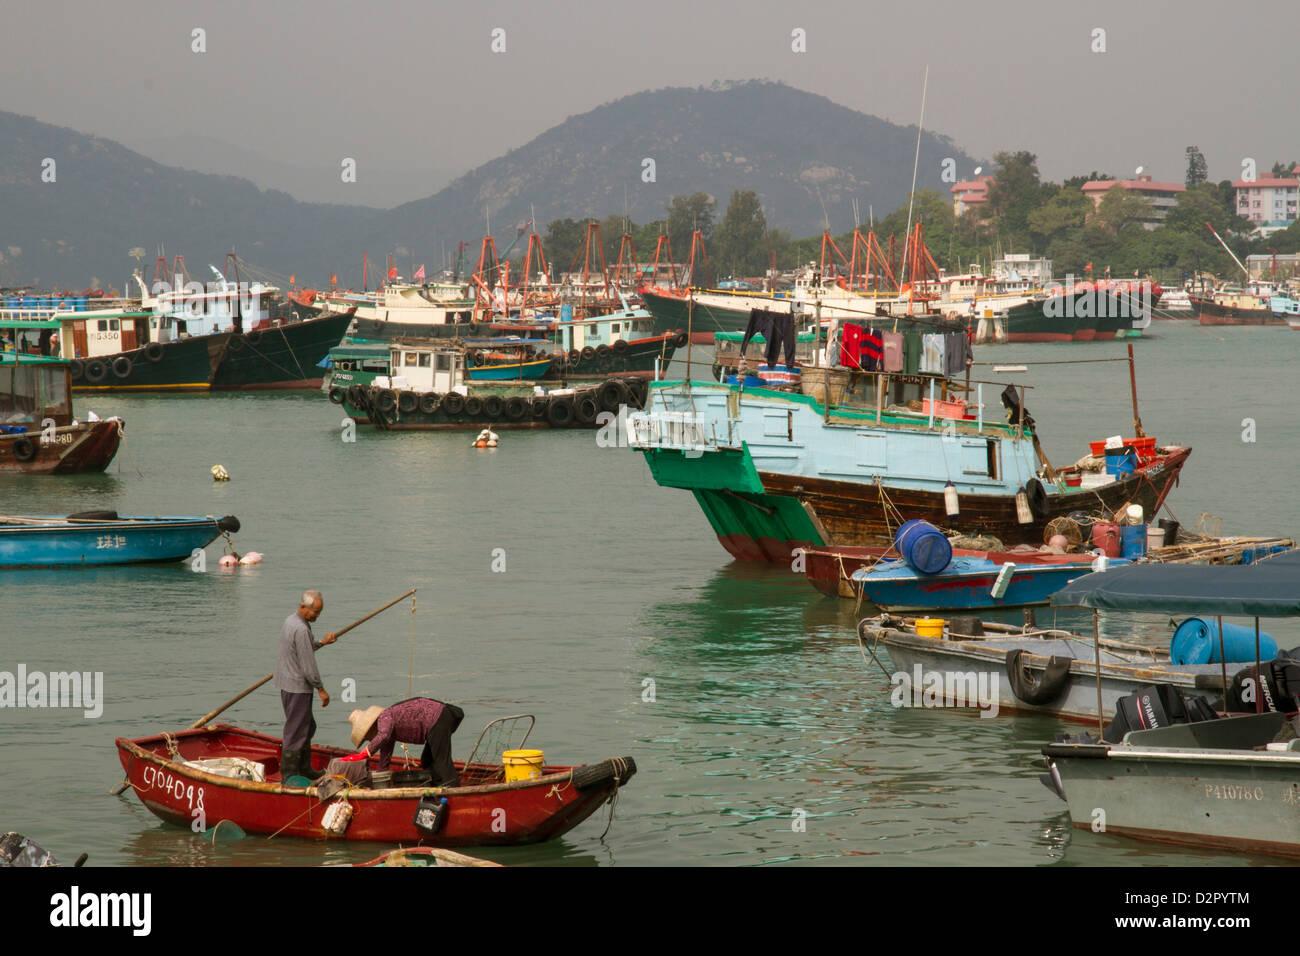 Harbour, Cheung Chau island, Hong Kong, China, Asia - Stock Image